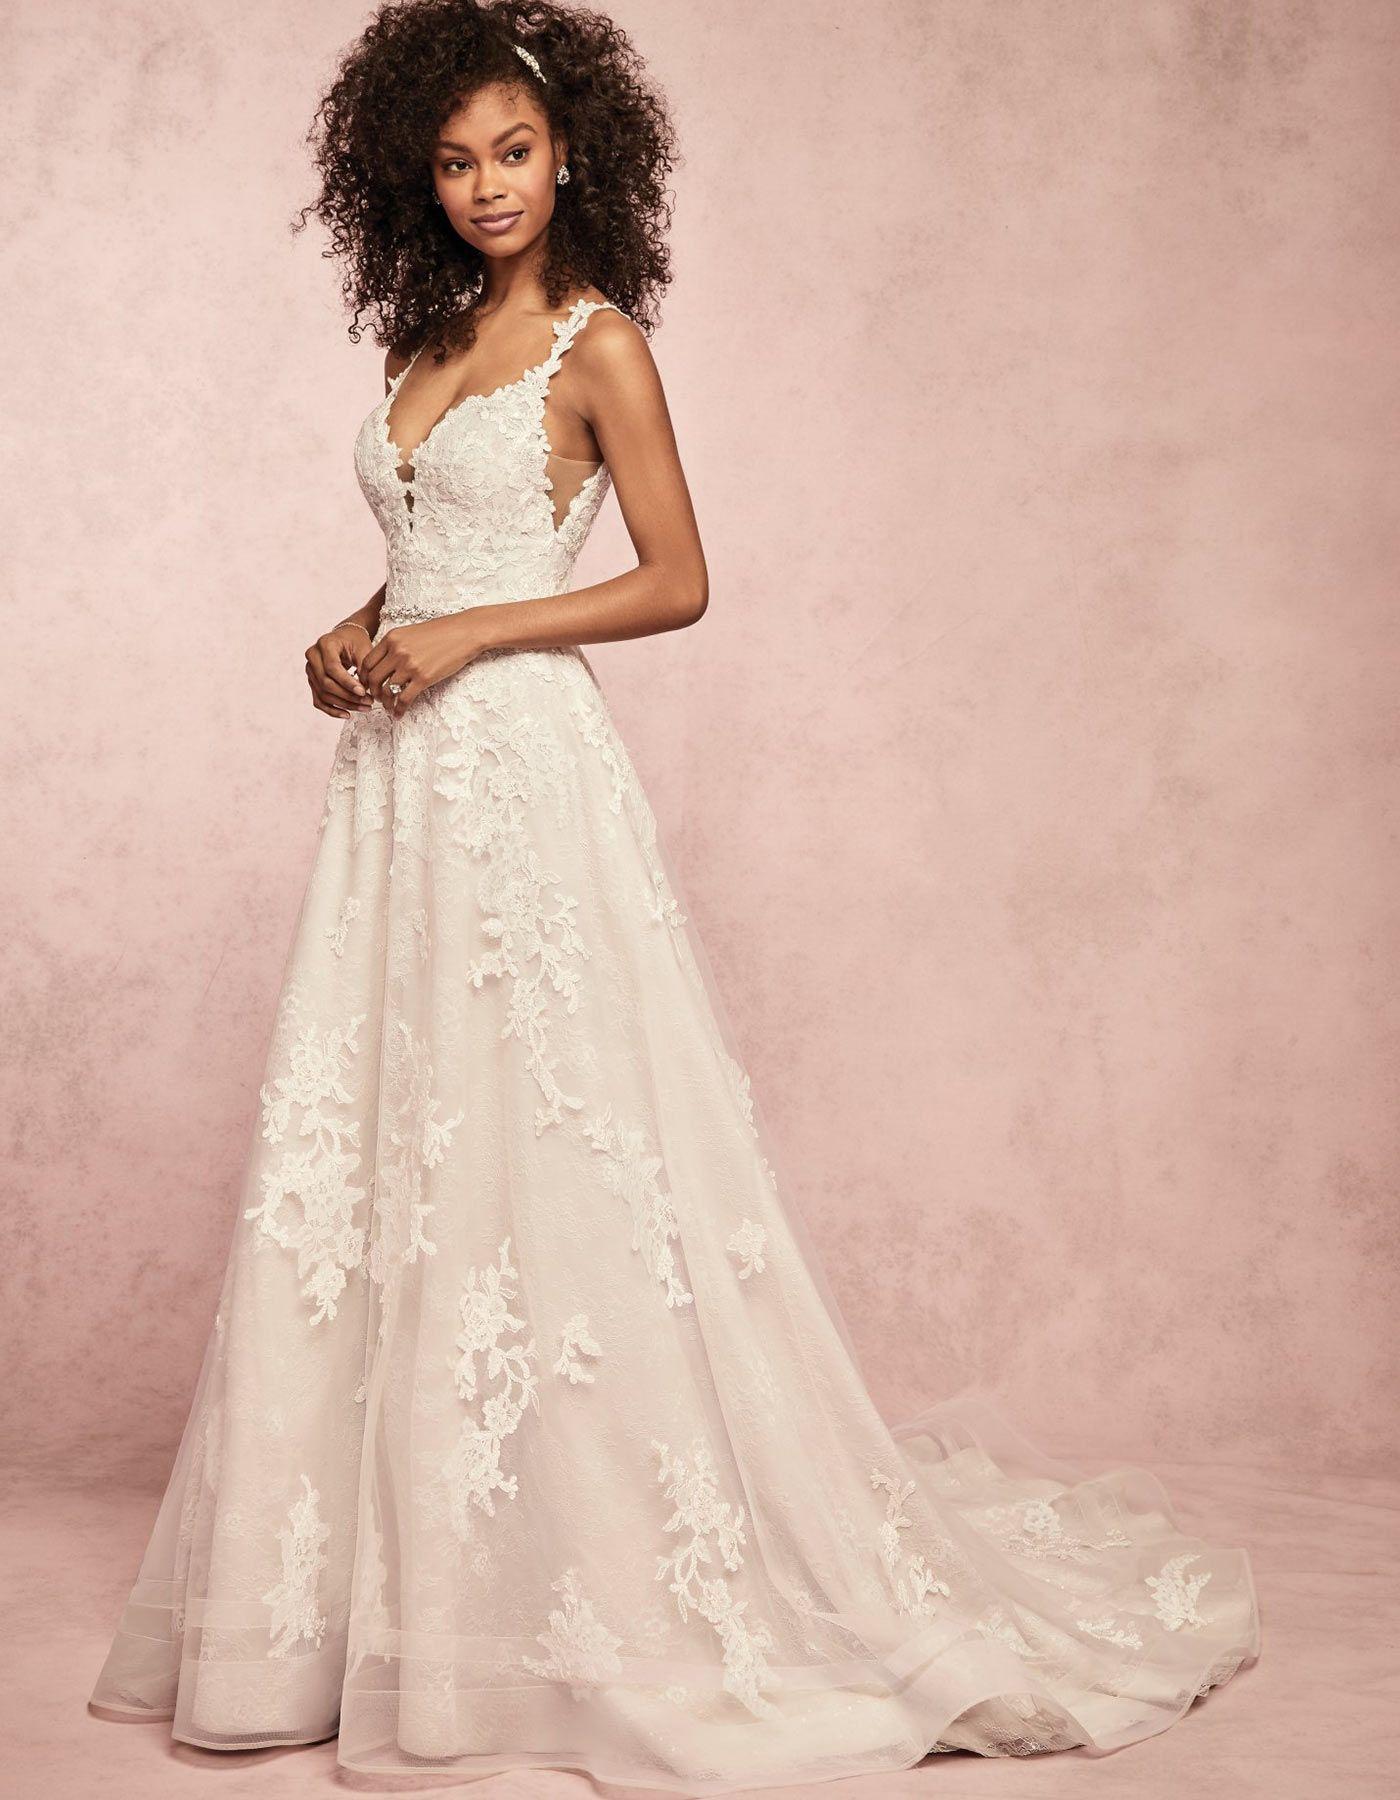 d9c955e11fbfd Where To Get Bridesmaid Dresses Melbourne - raveitsafe